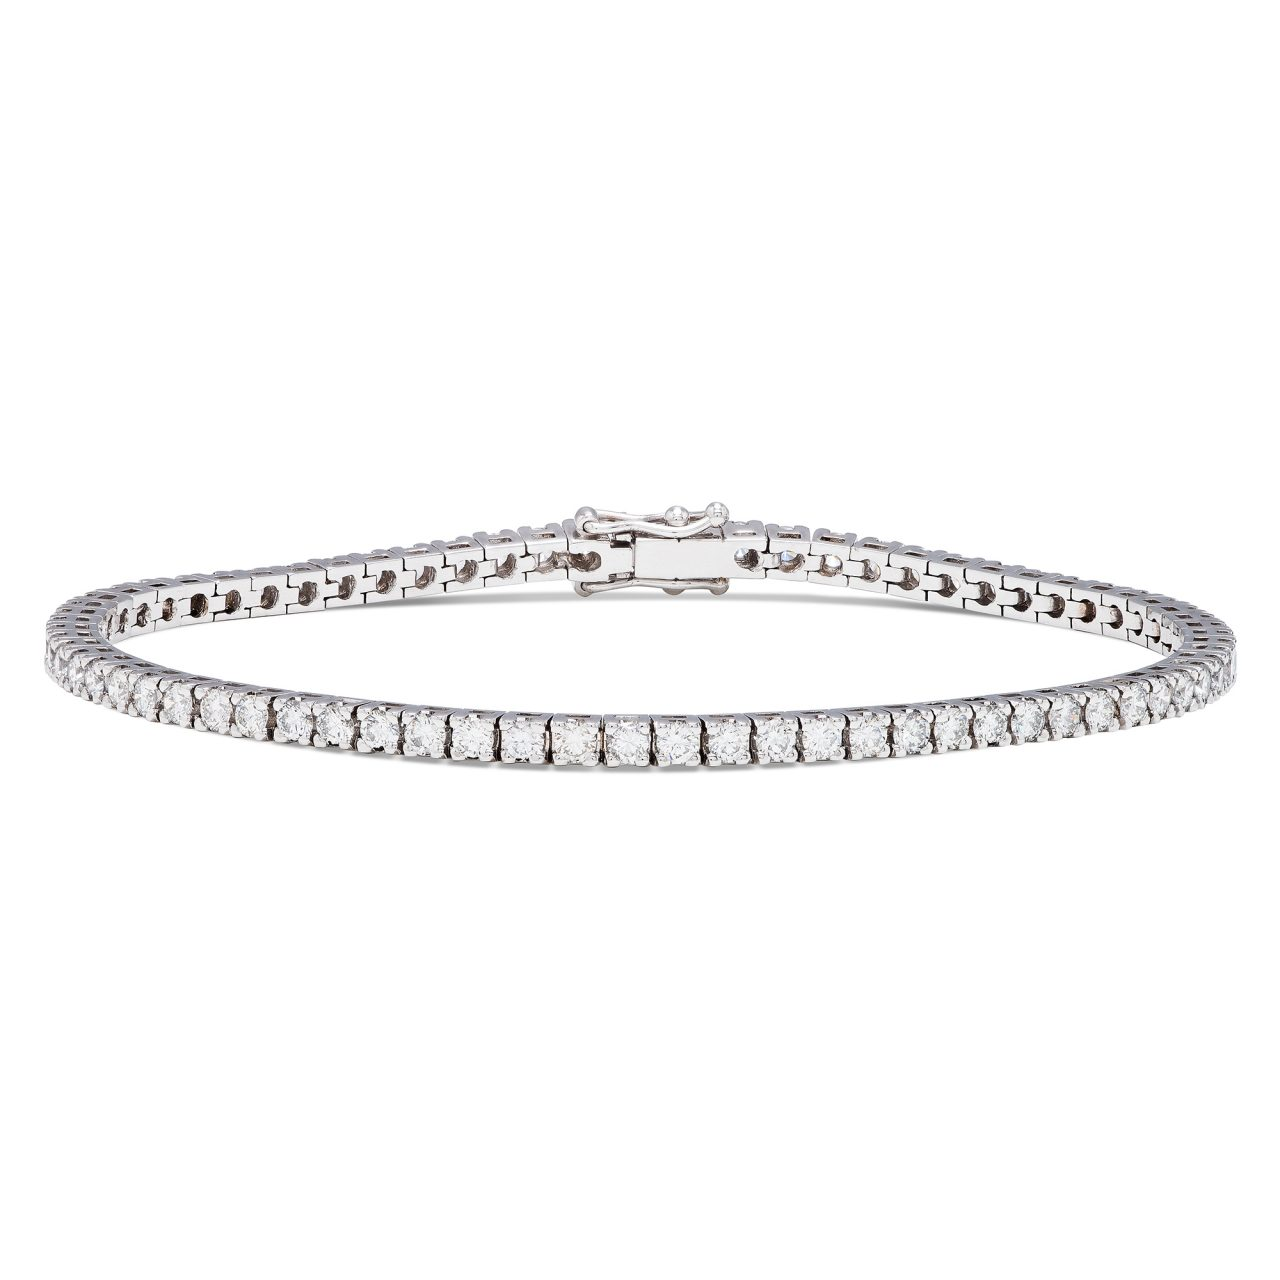 18k white gold tennis bracelet with 3,35 ct diamonds